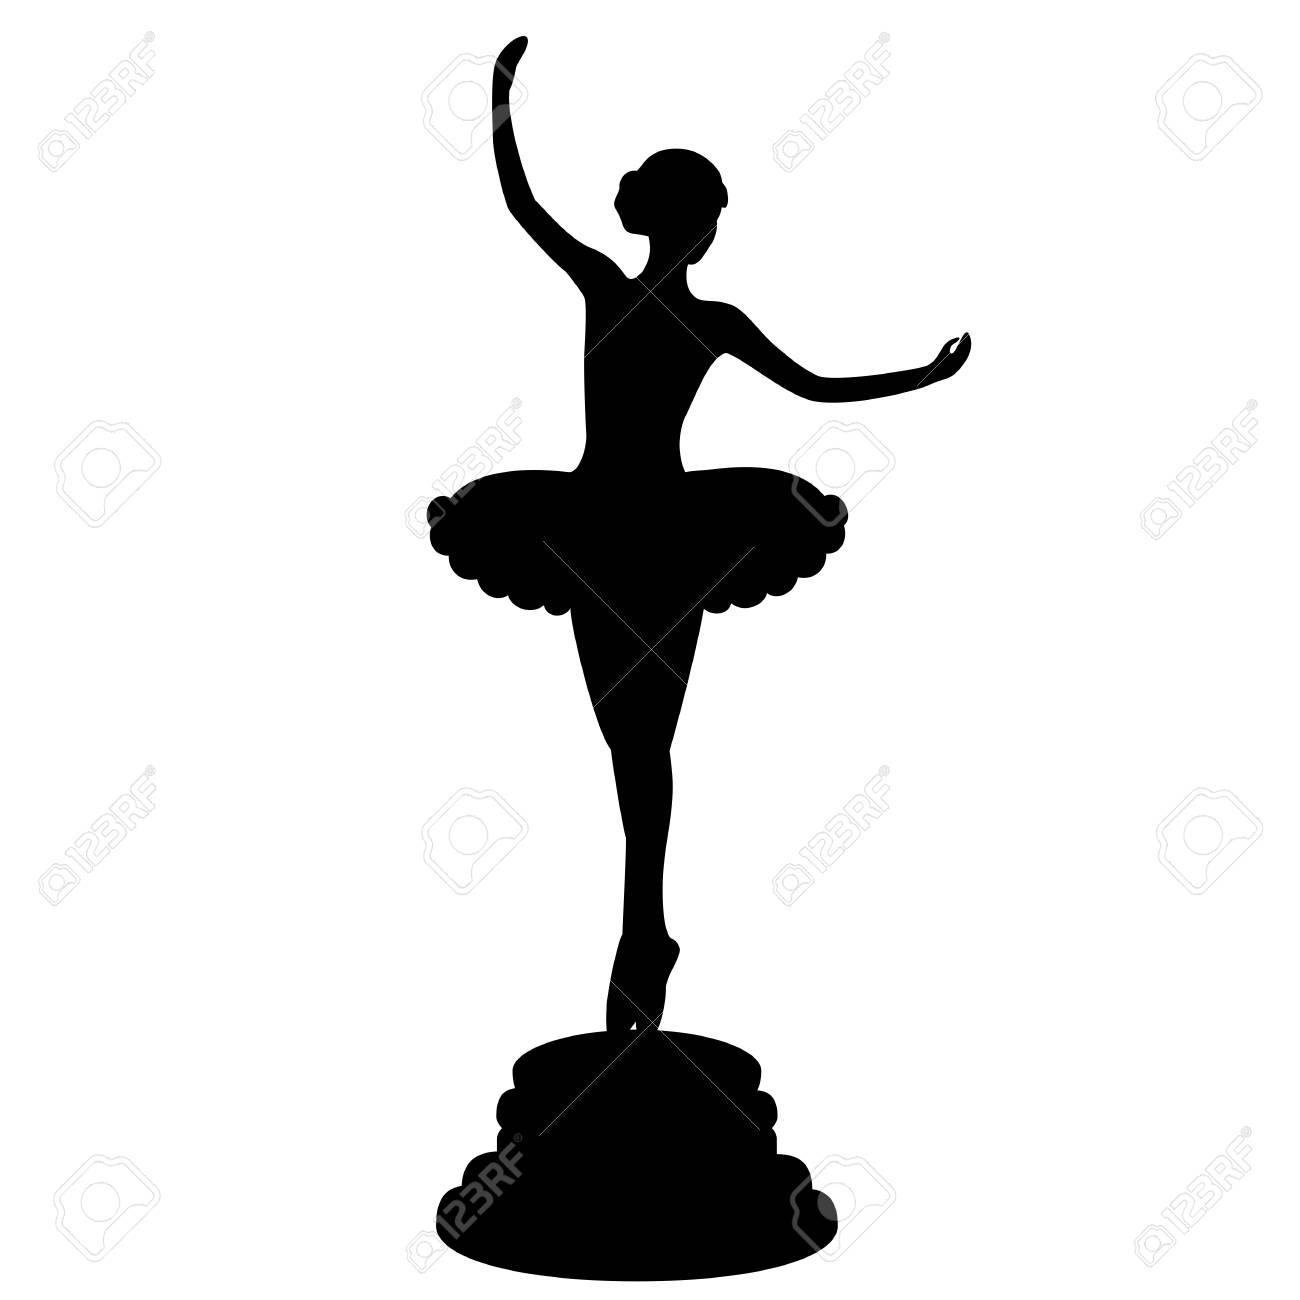 f1c1f7020cc3a Ballerina silhouette. Statuette. The black silhouette on a white  background. Vector illustration.